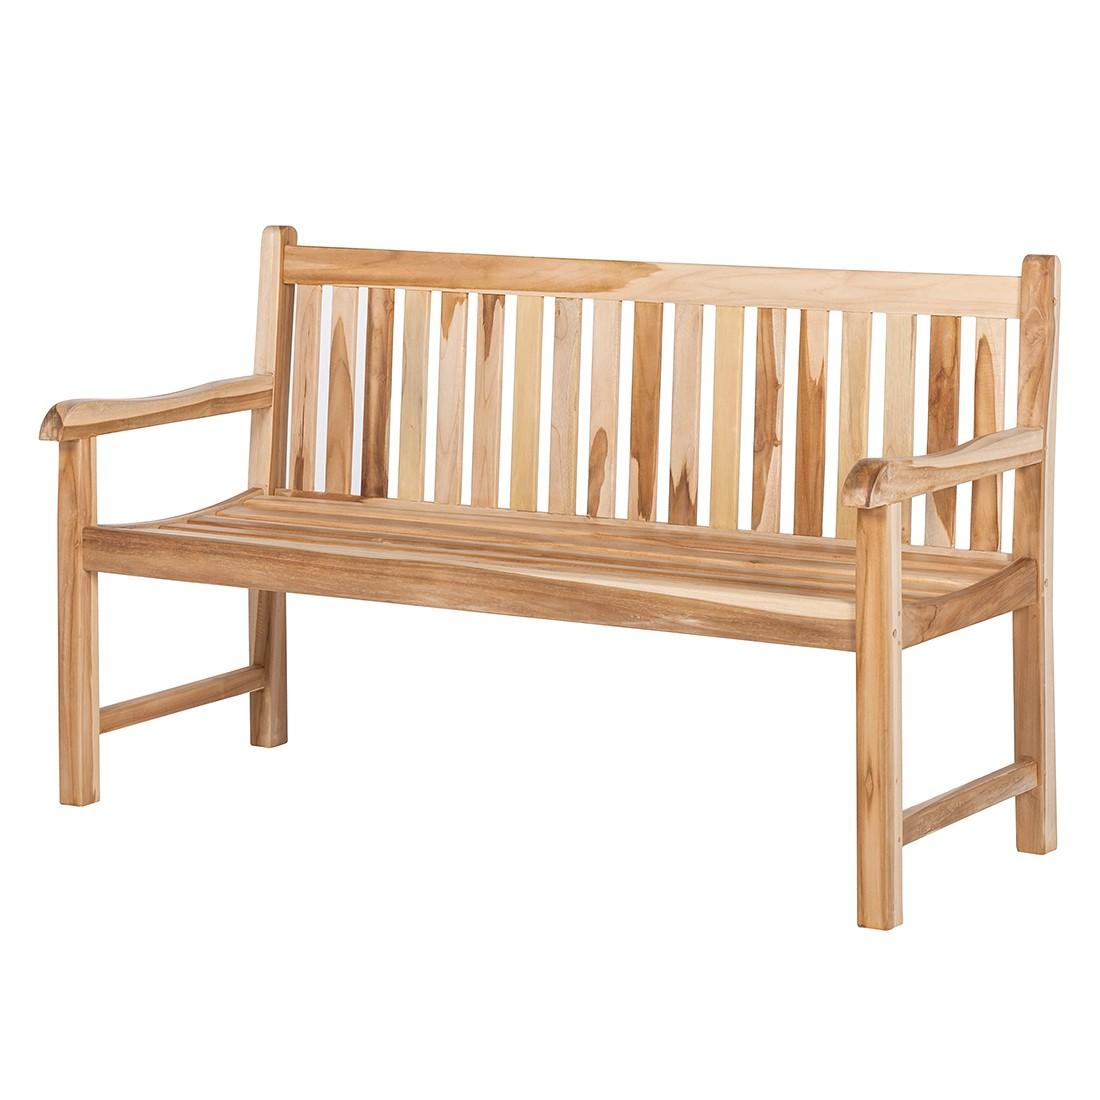 gartenbank holz massiv teakholz 182456 eine interessante idee f r die gestaltung. Black Bedroom Furniture Sets. Home Design Ideas